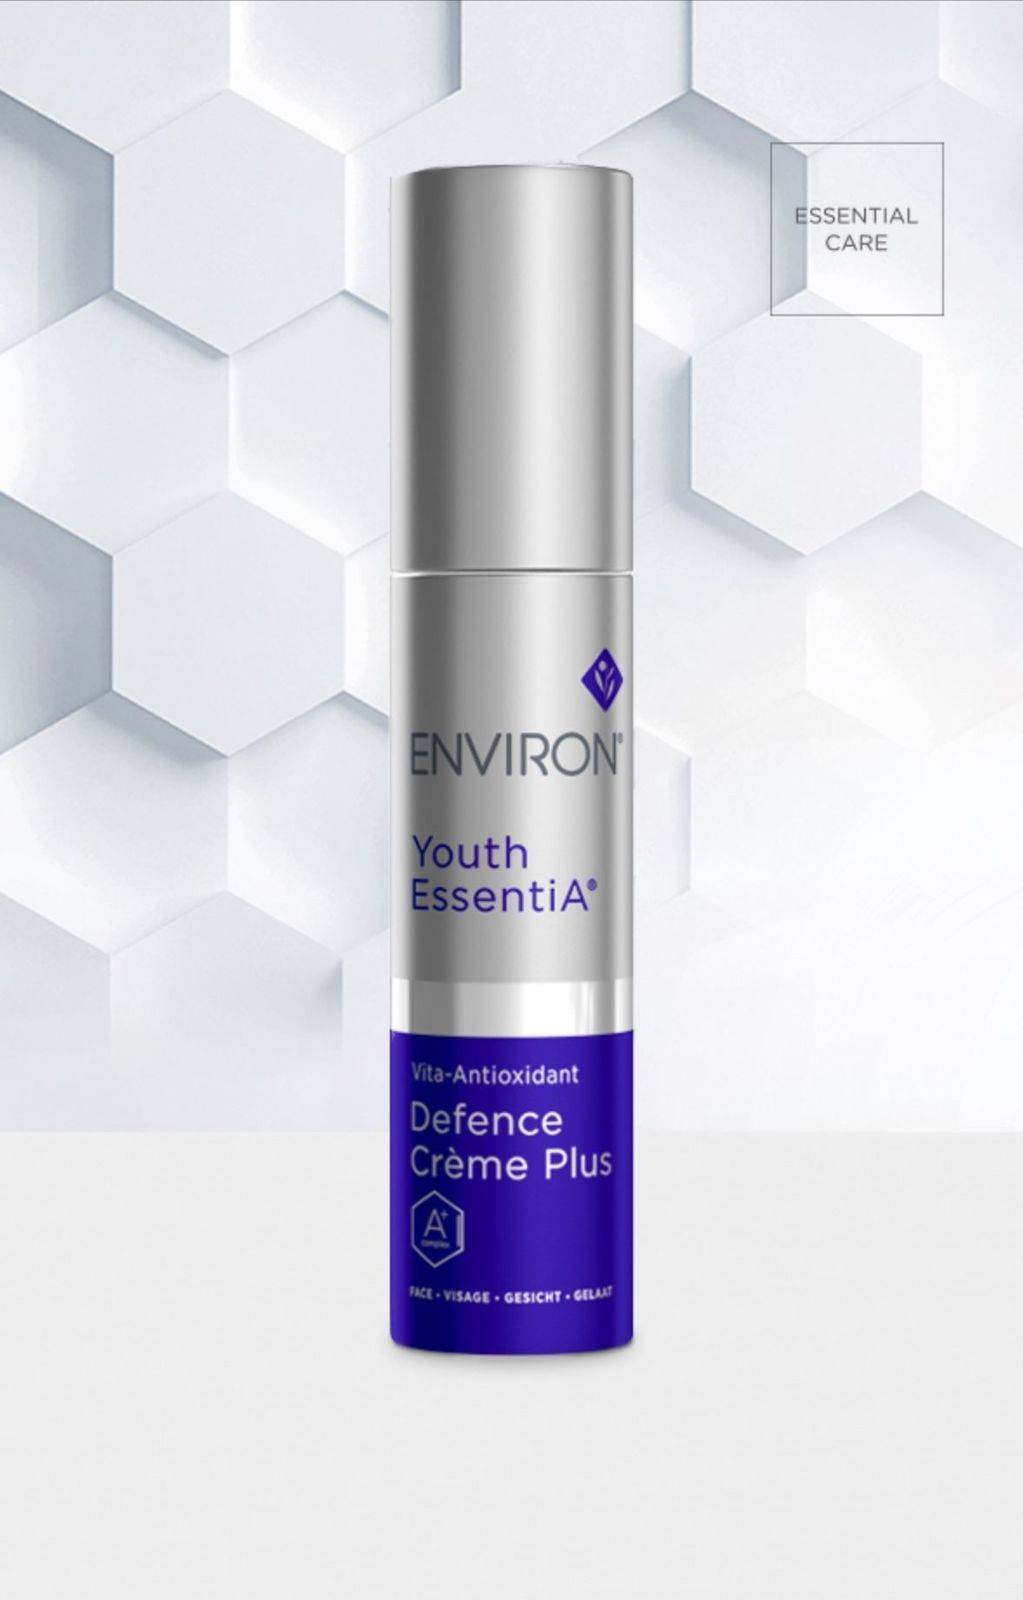 Youth EssentiA Vita-Antioxidant Defence Crème Plus